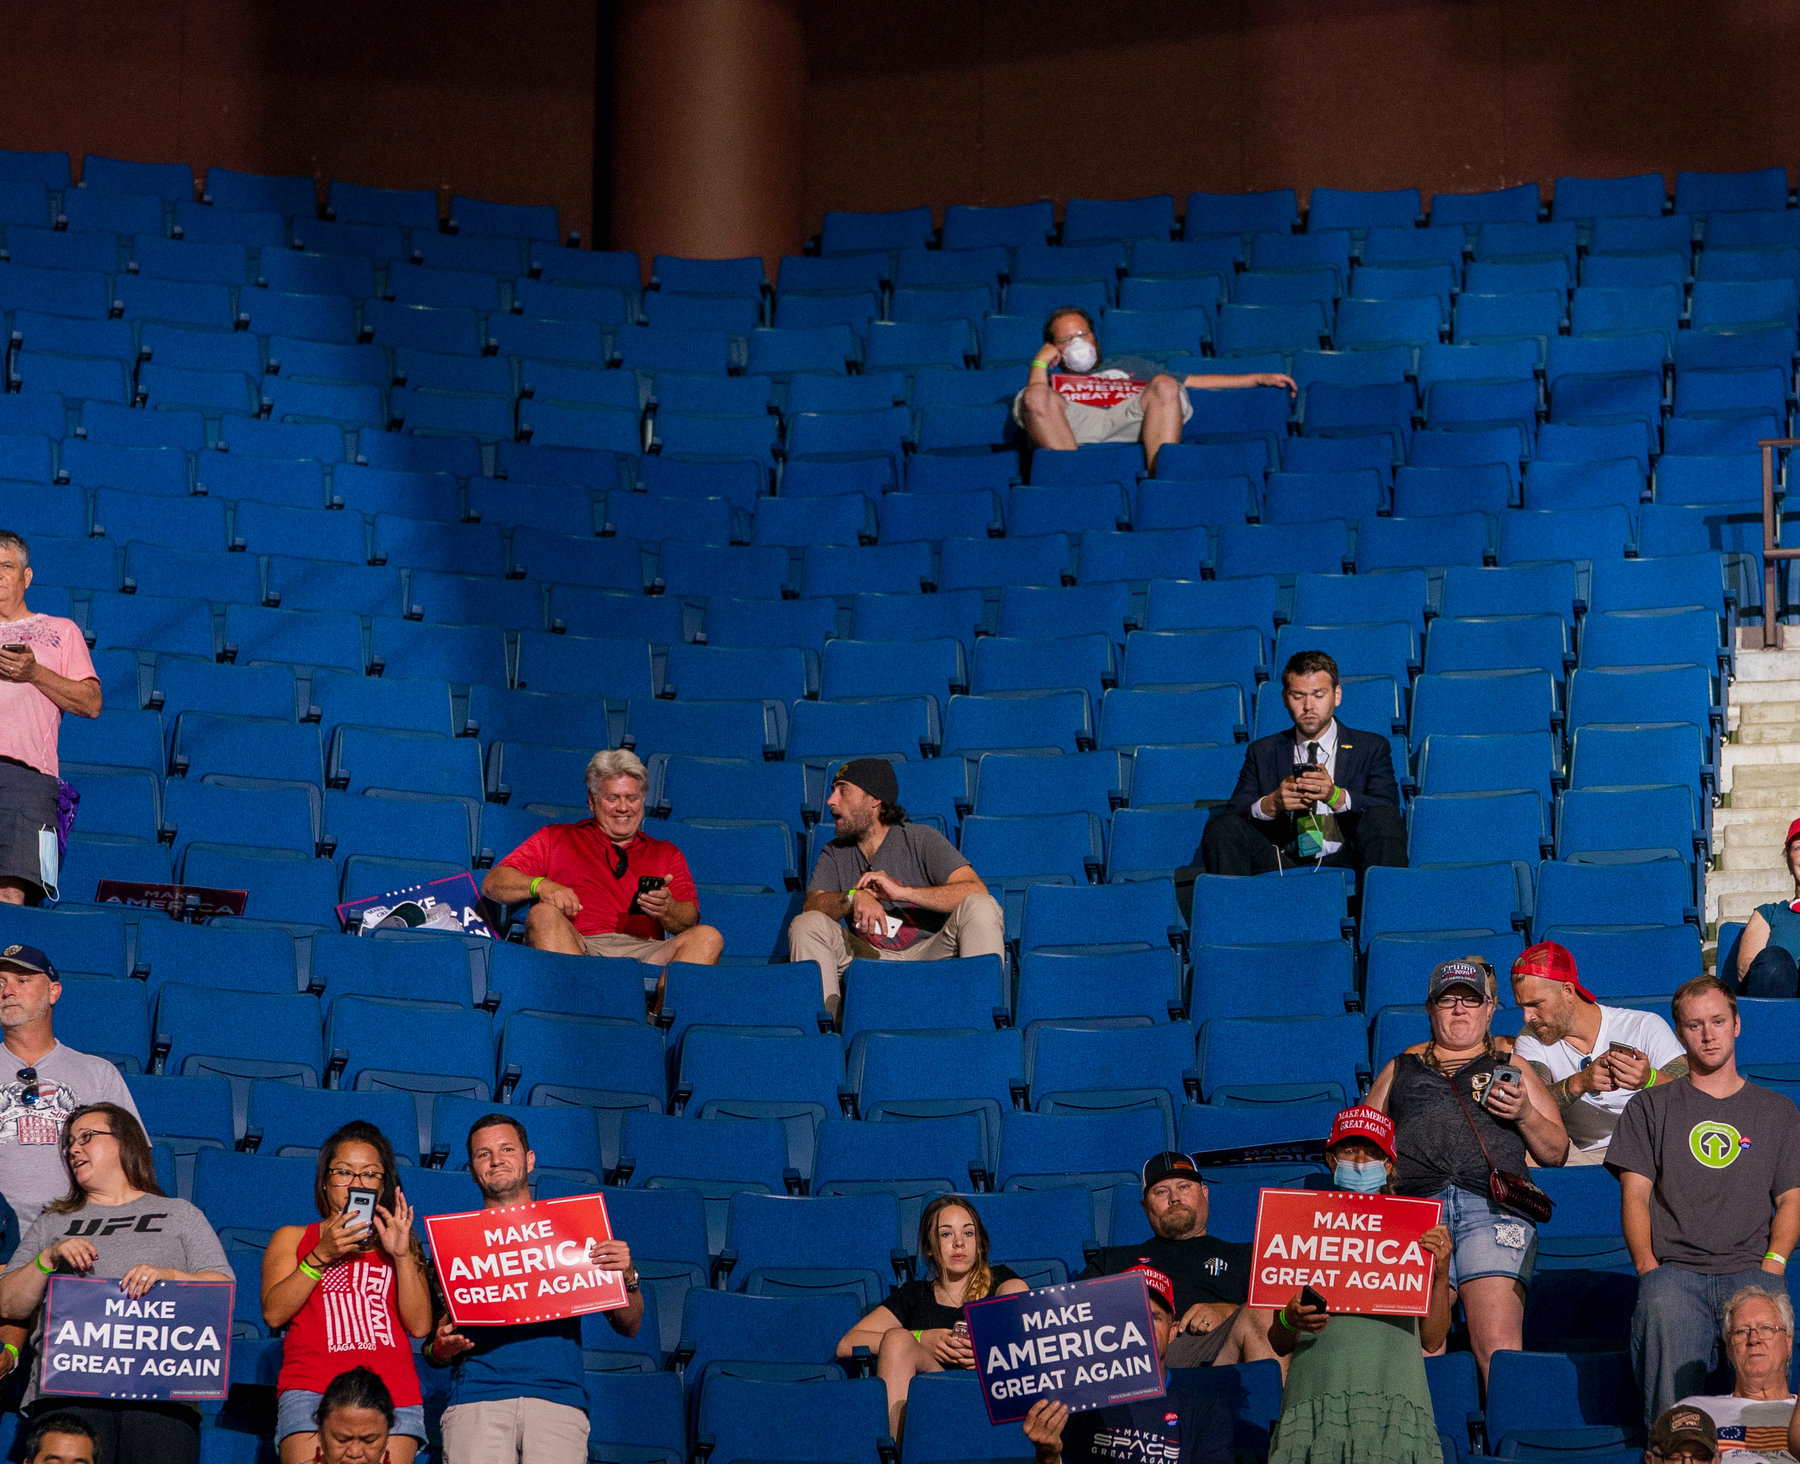 13990402000384 Test NewPhotoFree - رئیس کارزار انتخاباتی ترامپ: صندلیهای خالی کار گروه موسیقی «پاپ کرهای» بود!